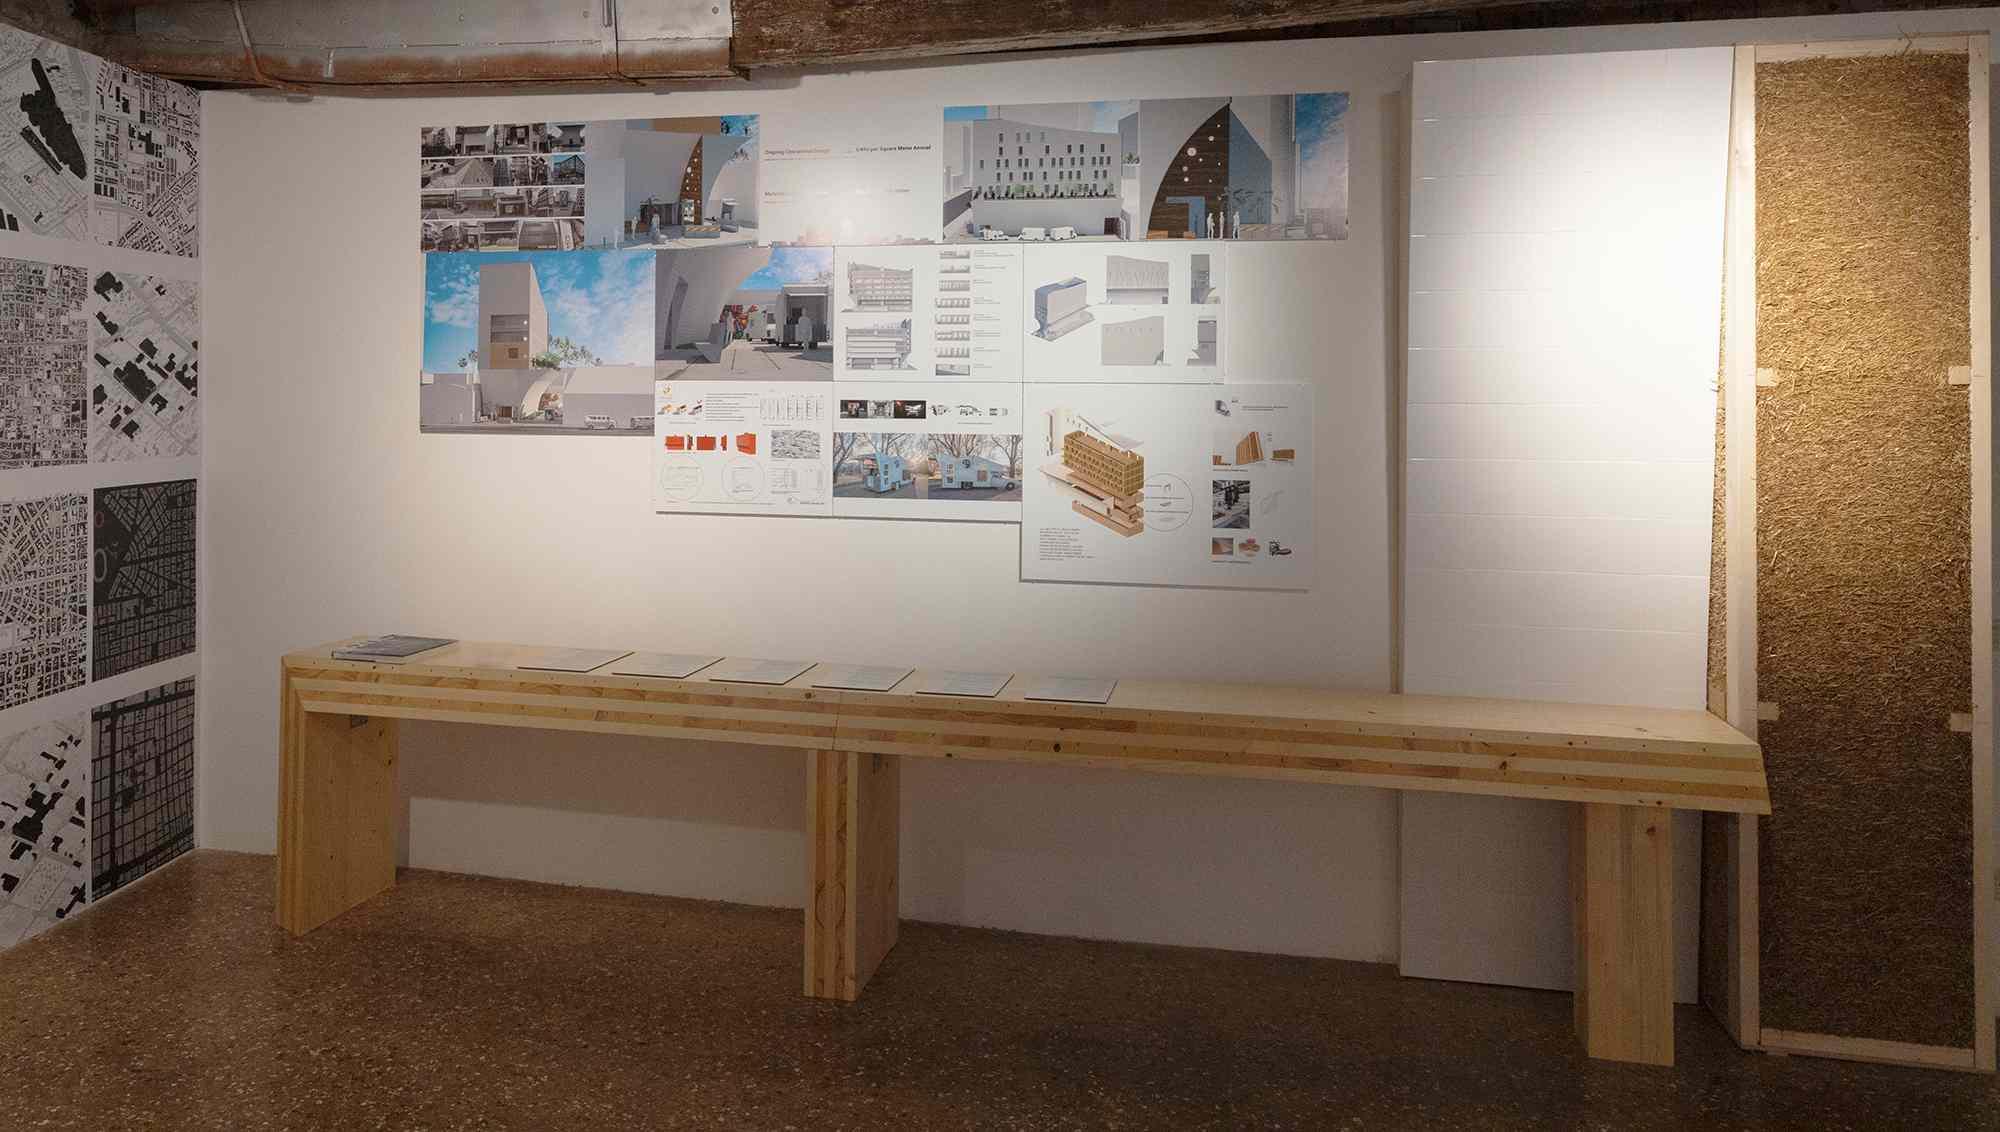 Exhibit at the Biennale